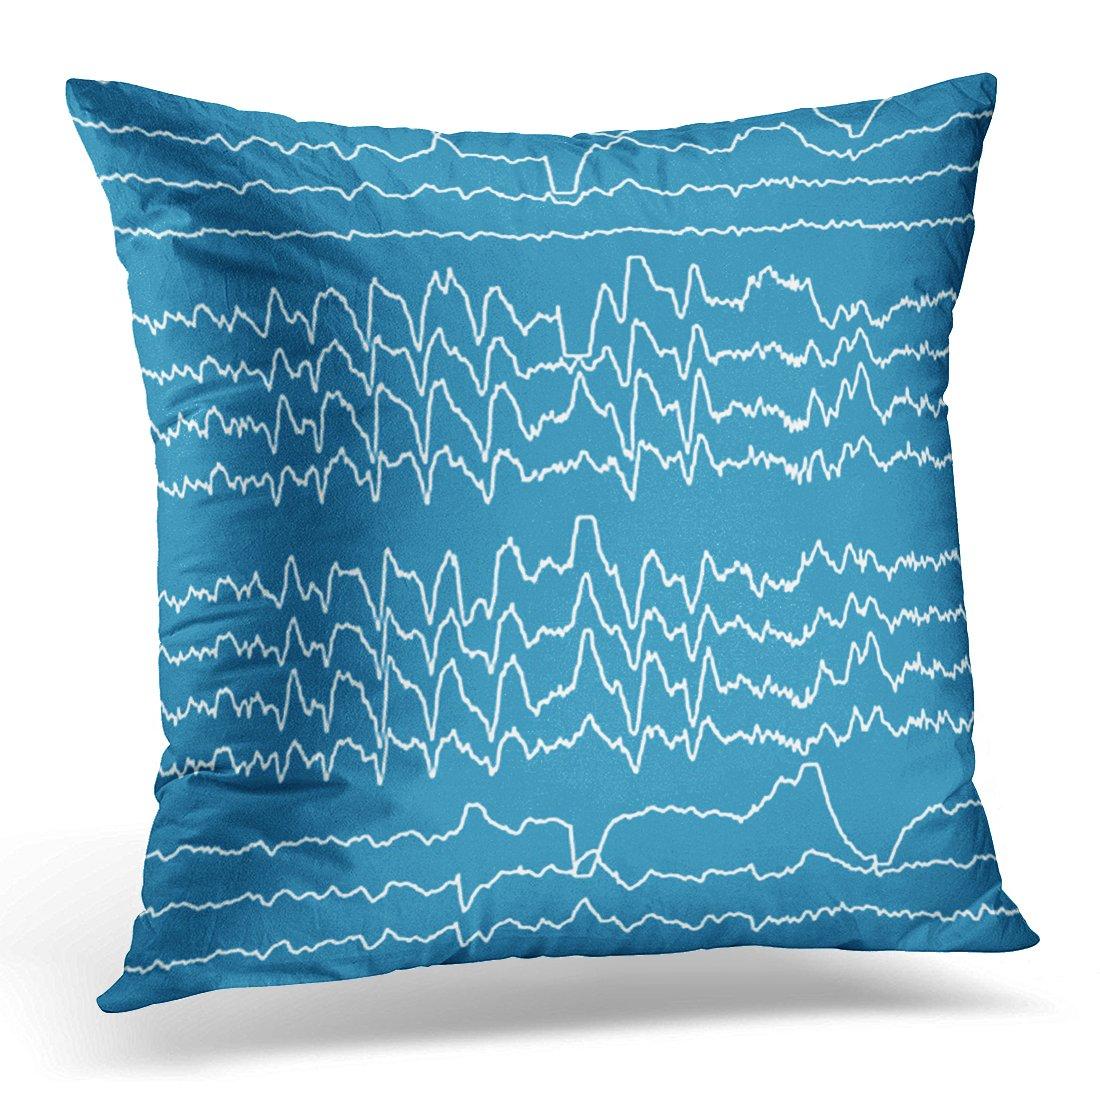 vanmiスロー枕カバーSleeping Rem睡眠Wave夢装飾枕ケースホーム装飾正方形枕 16 x 16 inches シルバー B07DB6YQGZ  16 x 16 inches